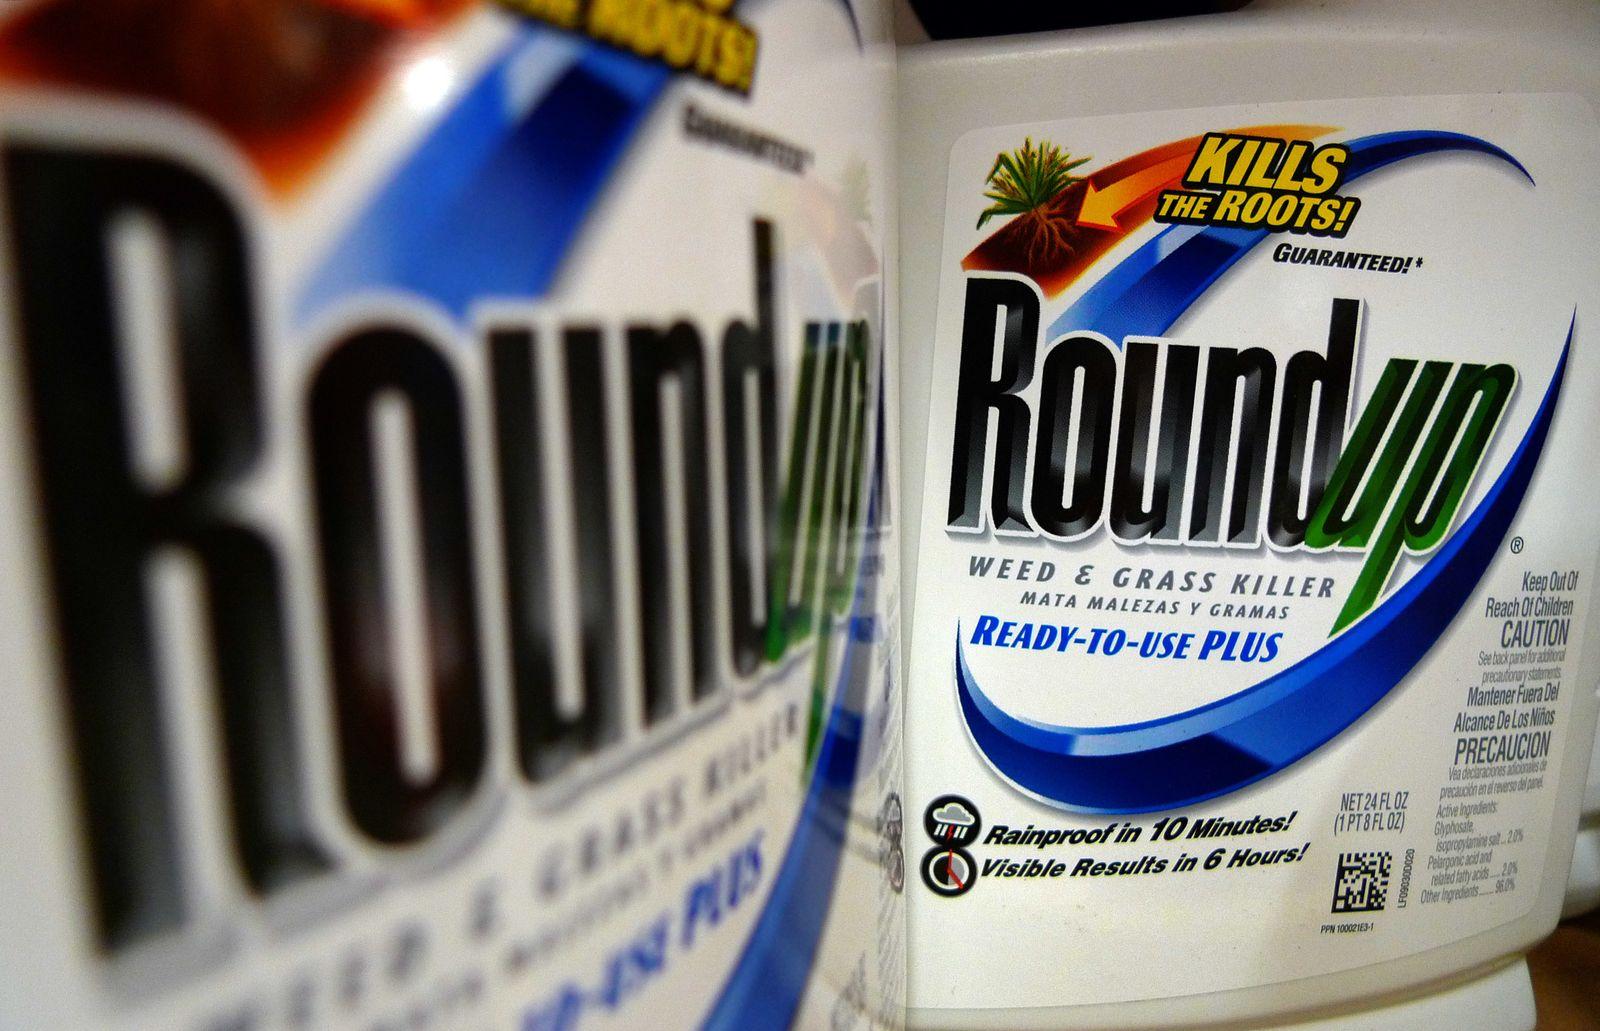 Monsanto / Roundup